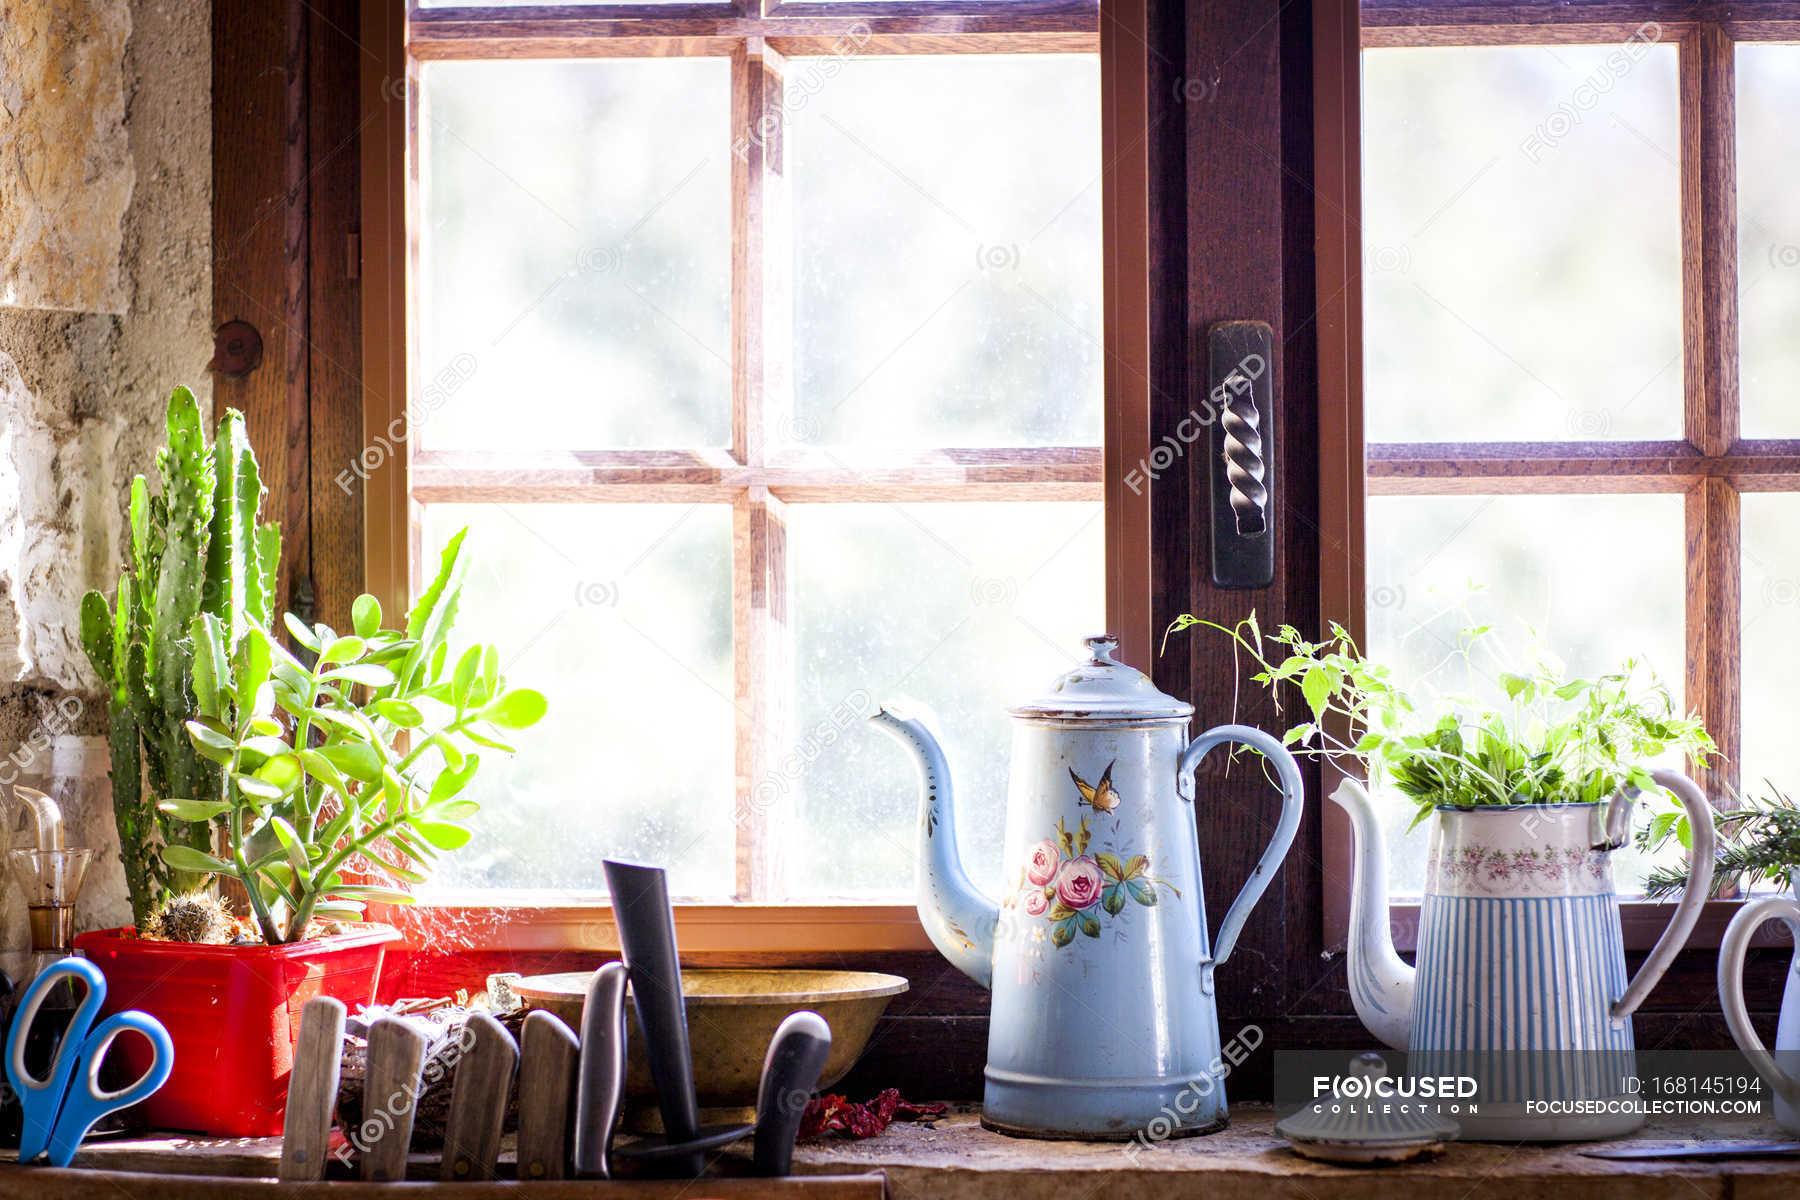 Rustic Coffee Pots And Pot Plants On Kitchen Windowsill Organic